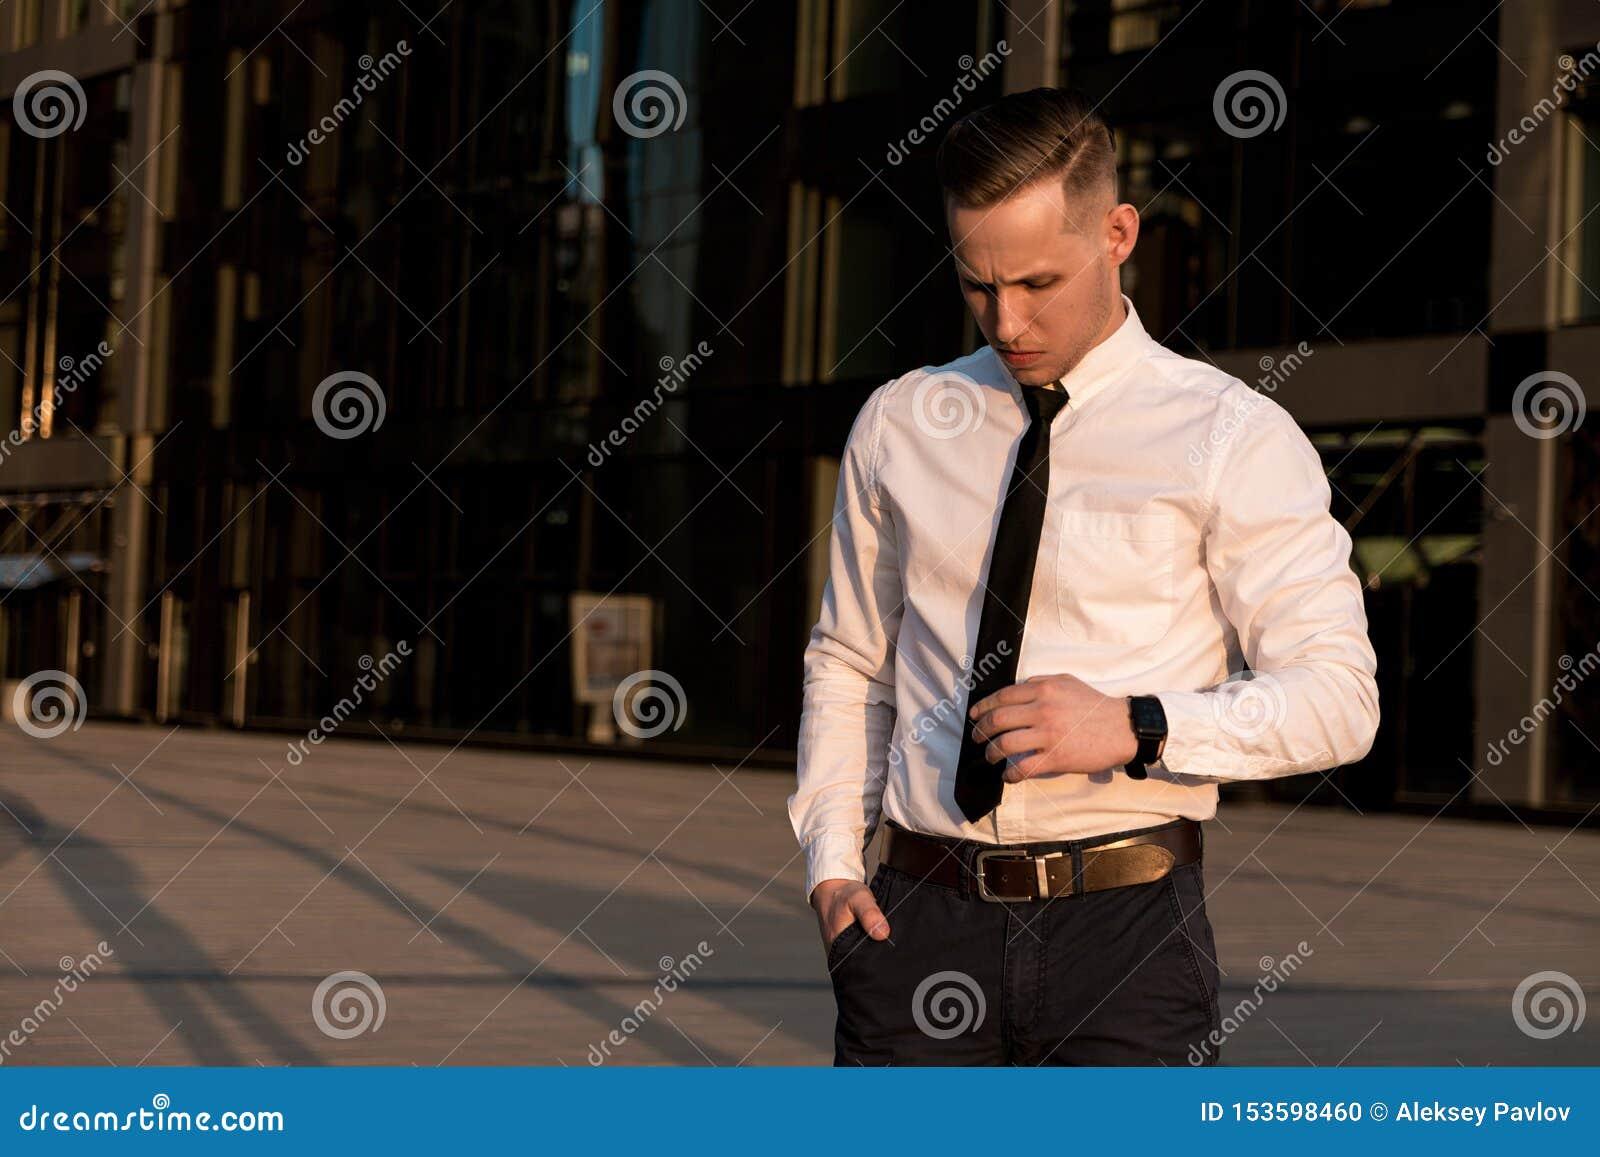 El hombre de negocios joven corrige un lazo